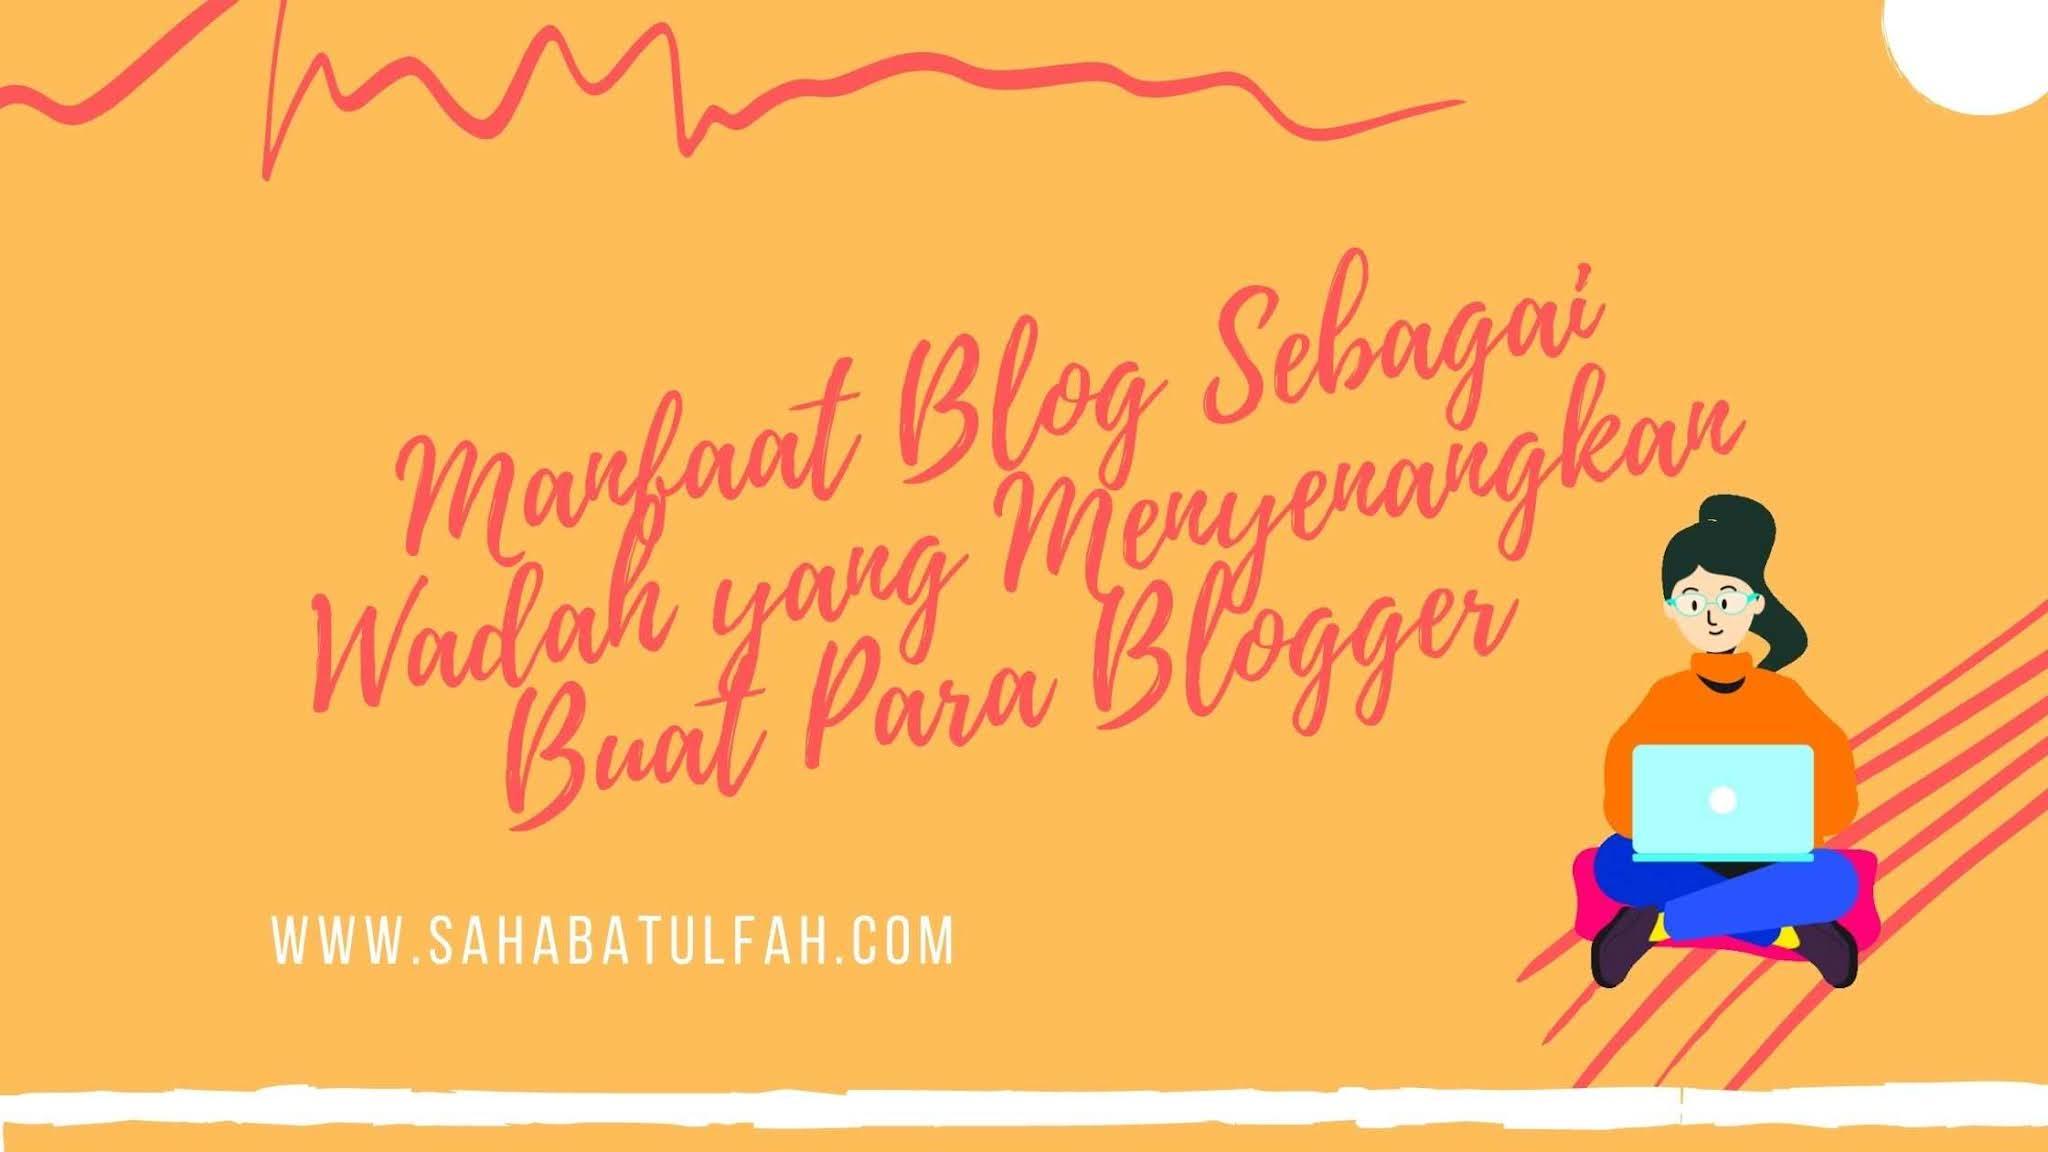 Manfaat Blog Buat Para Blogger